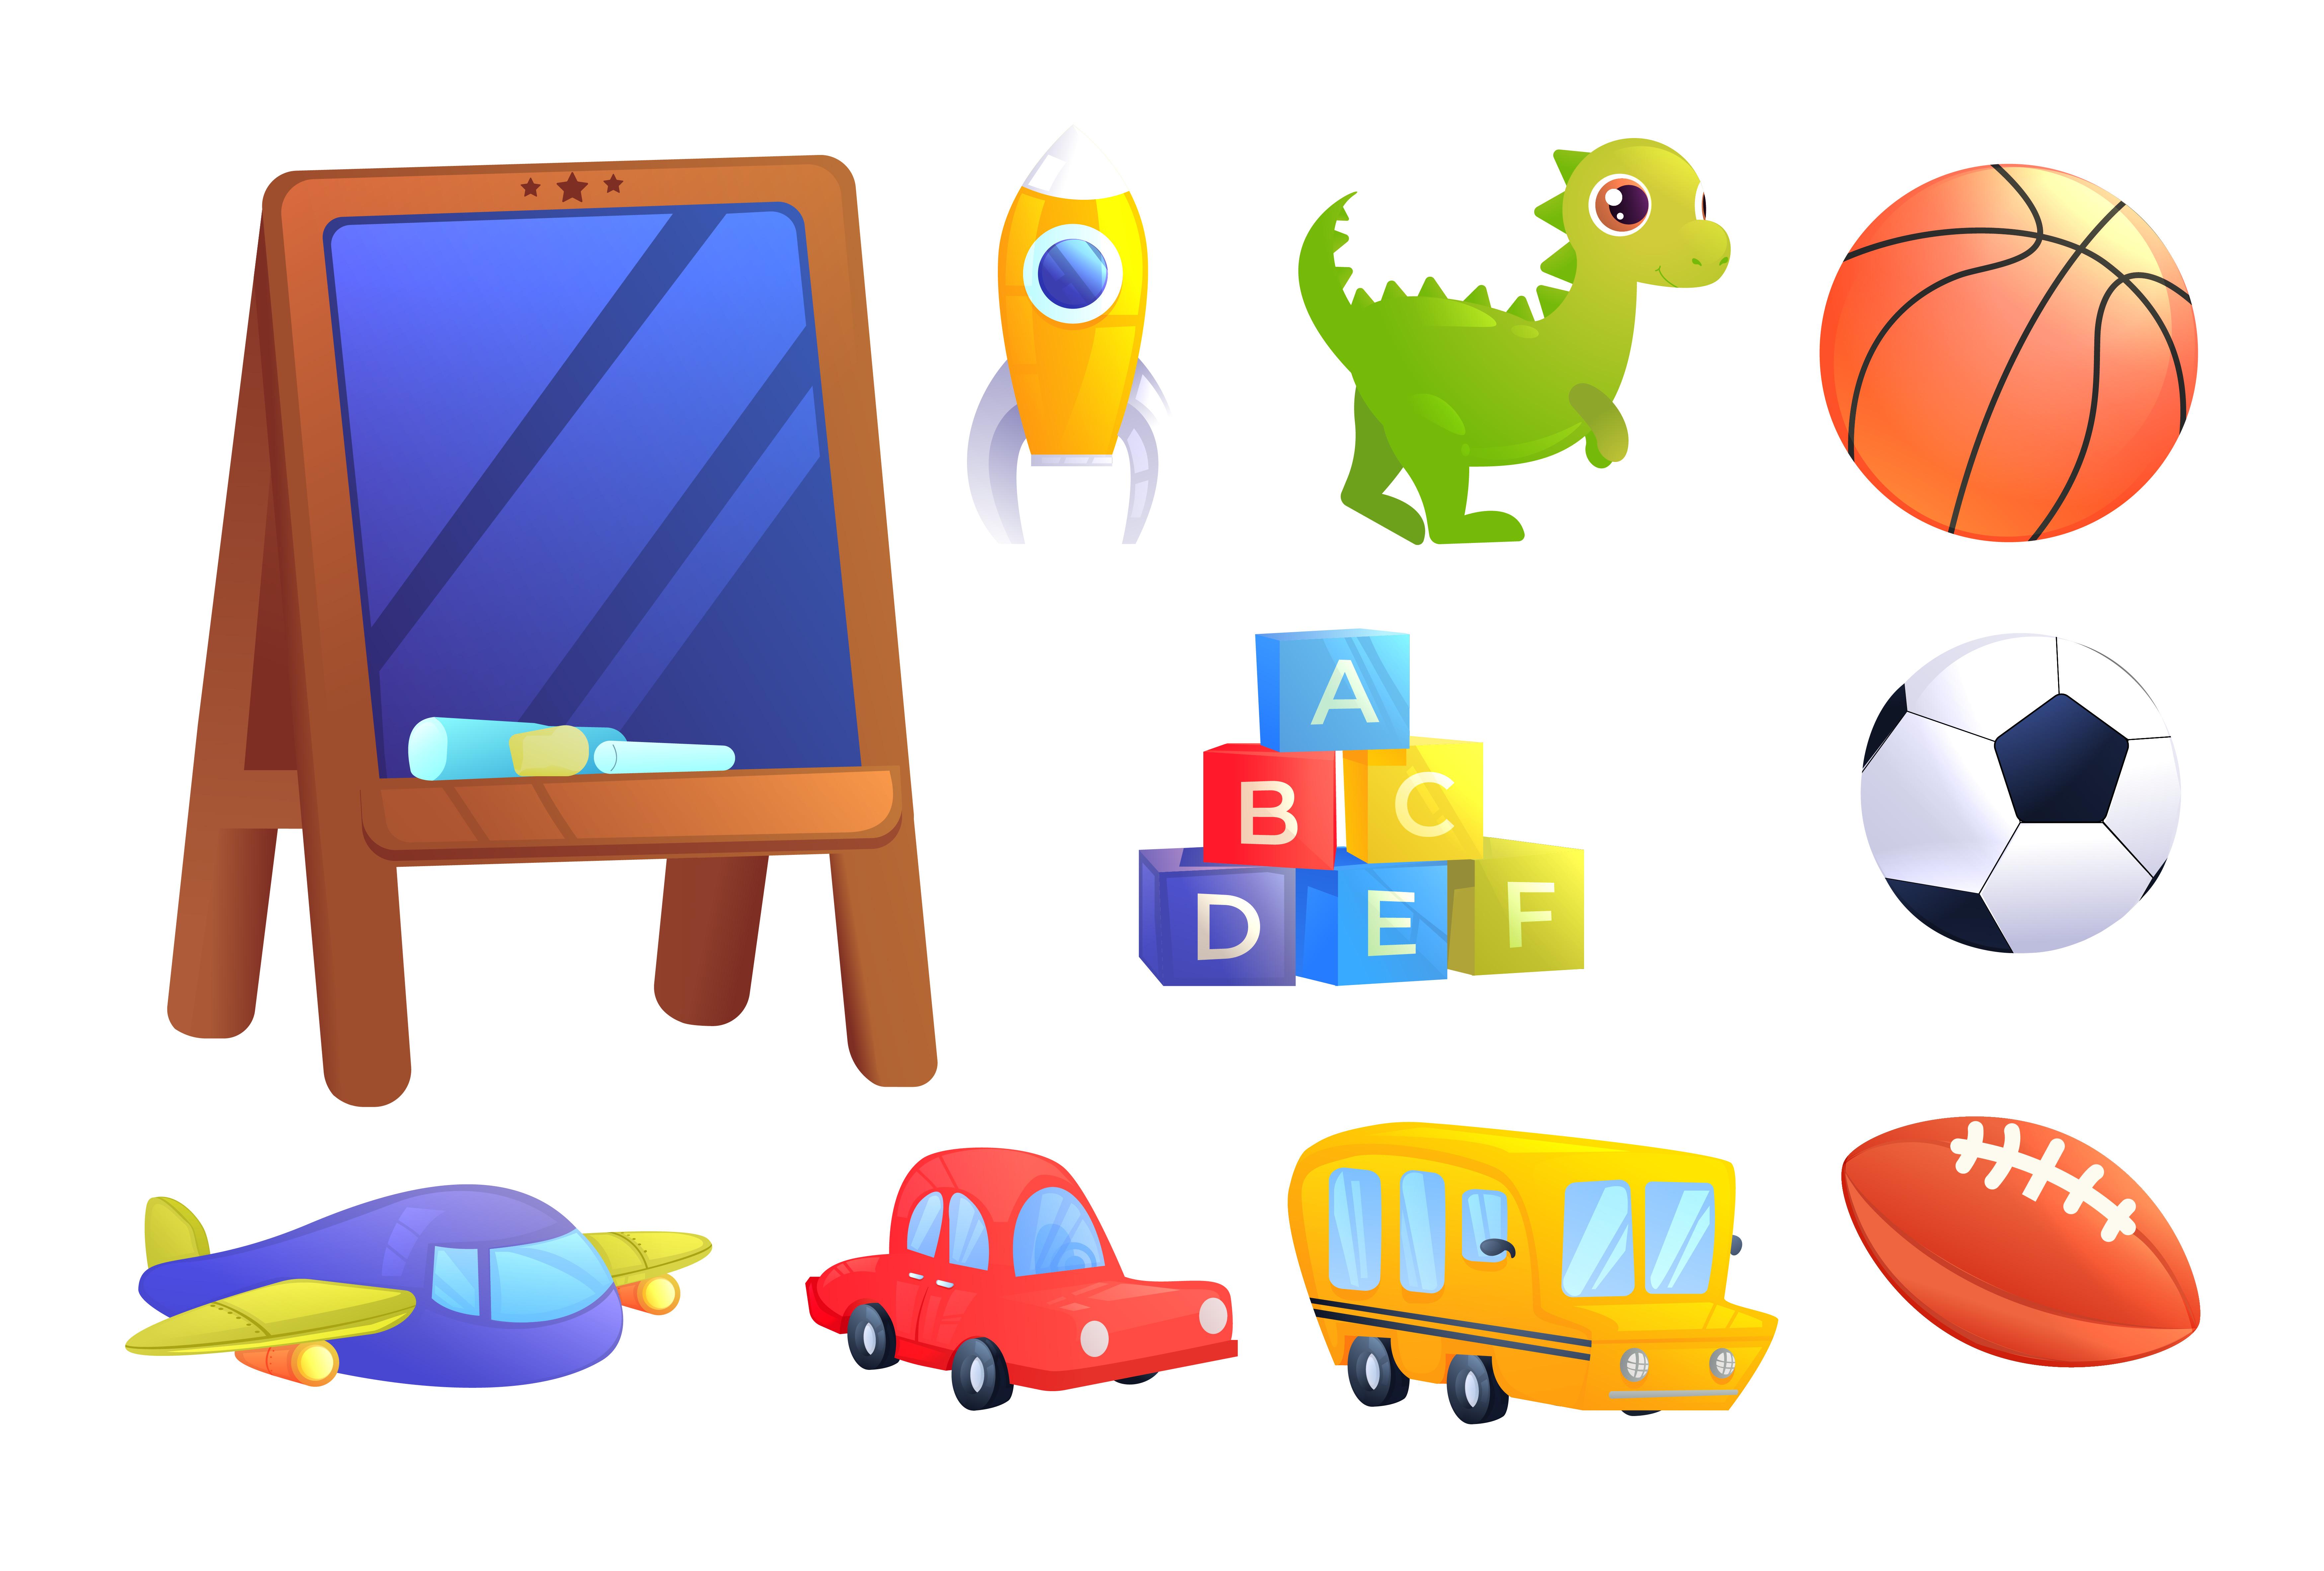 Kids Toys set. A car, bus, airplane, dinosaur,cubes with ...